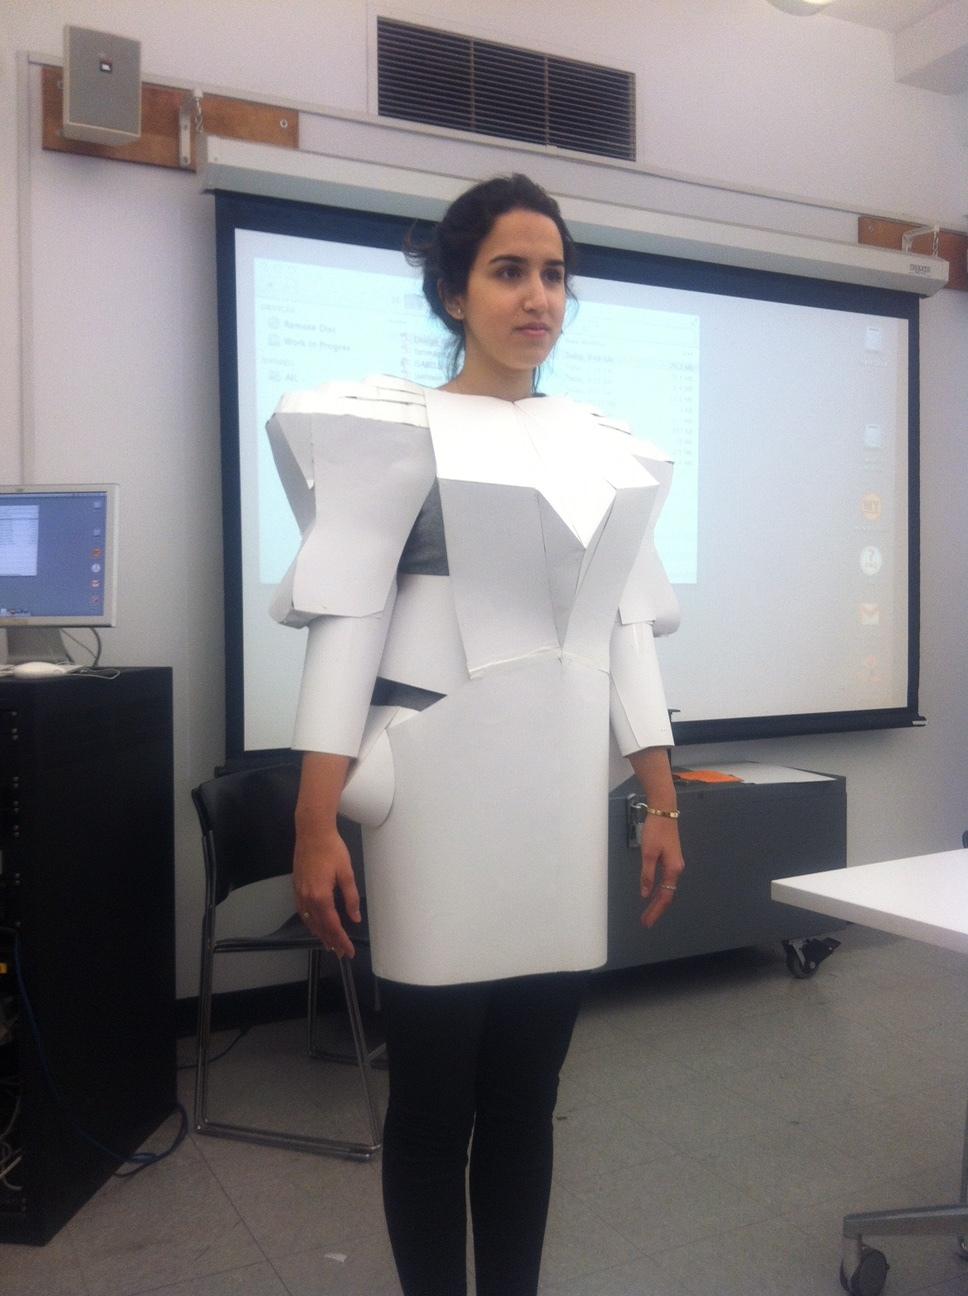 Parsons, The New School, Fashion Design Studio, BFA